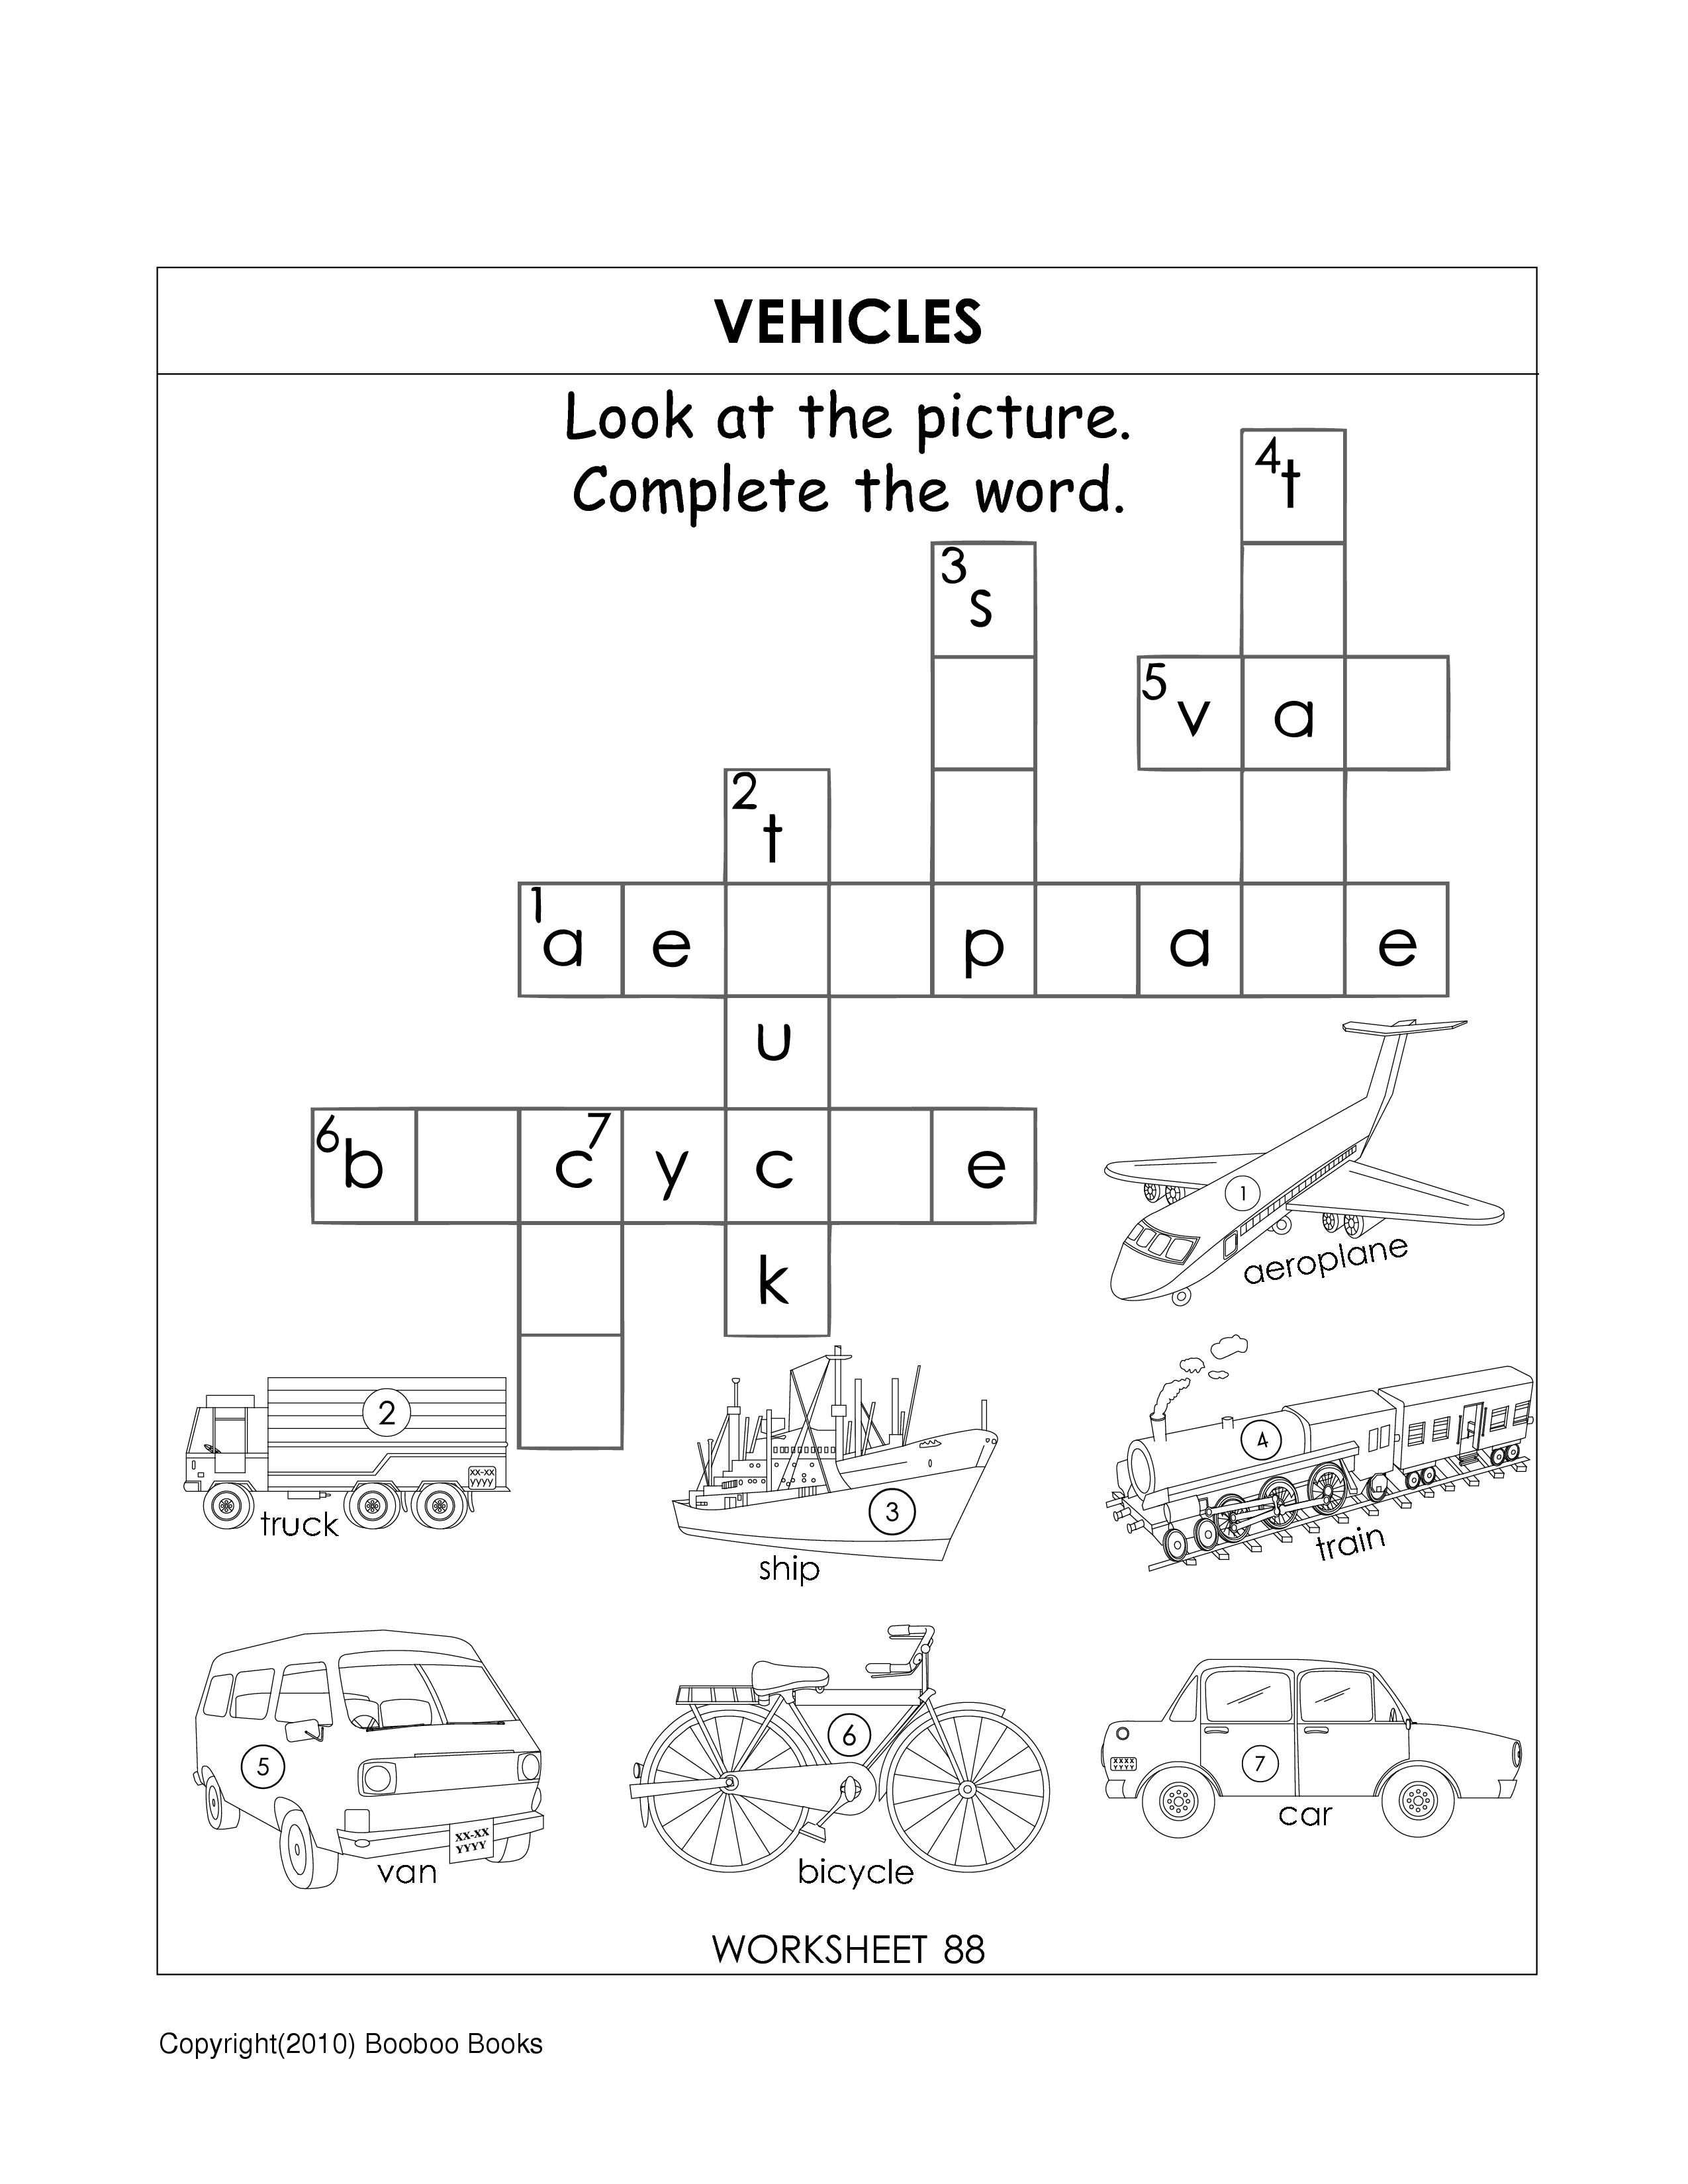 A Guide to Using Printable Kindergarten Worksheets | Kindergarten ...